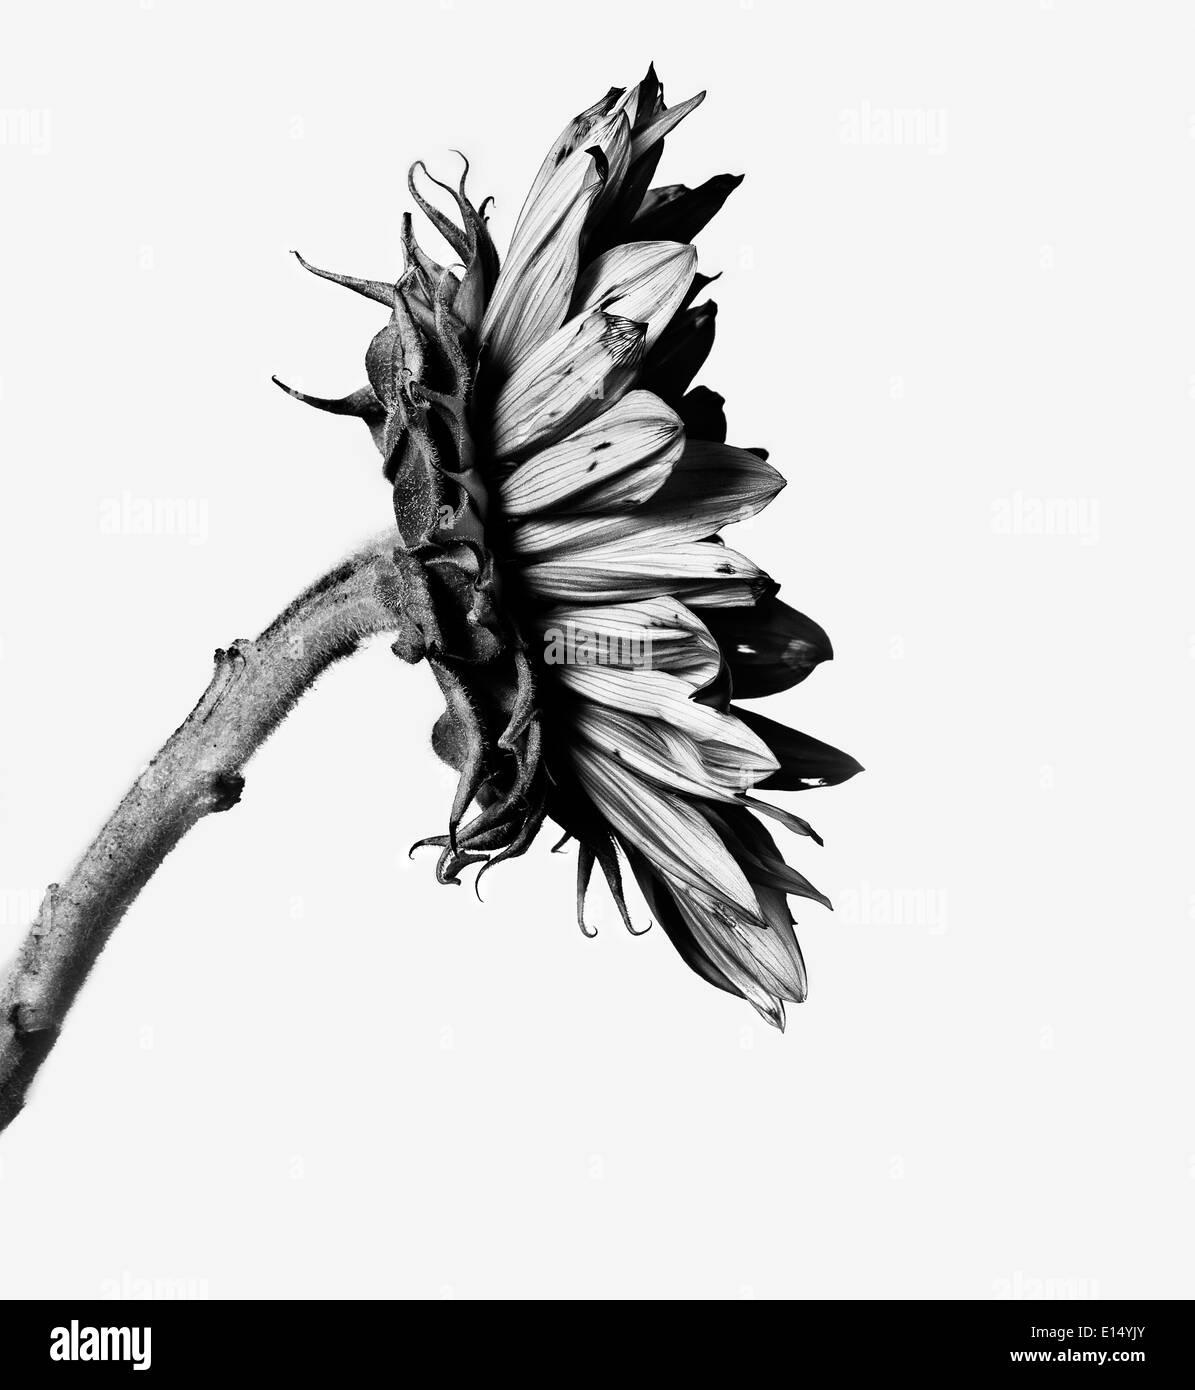 Girasol en blanco y negro Imagen De Stock